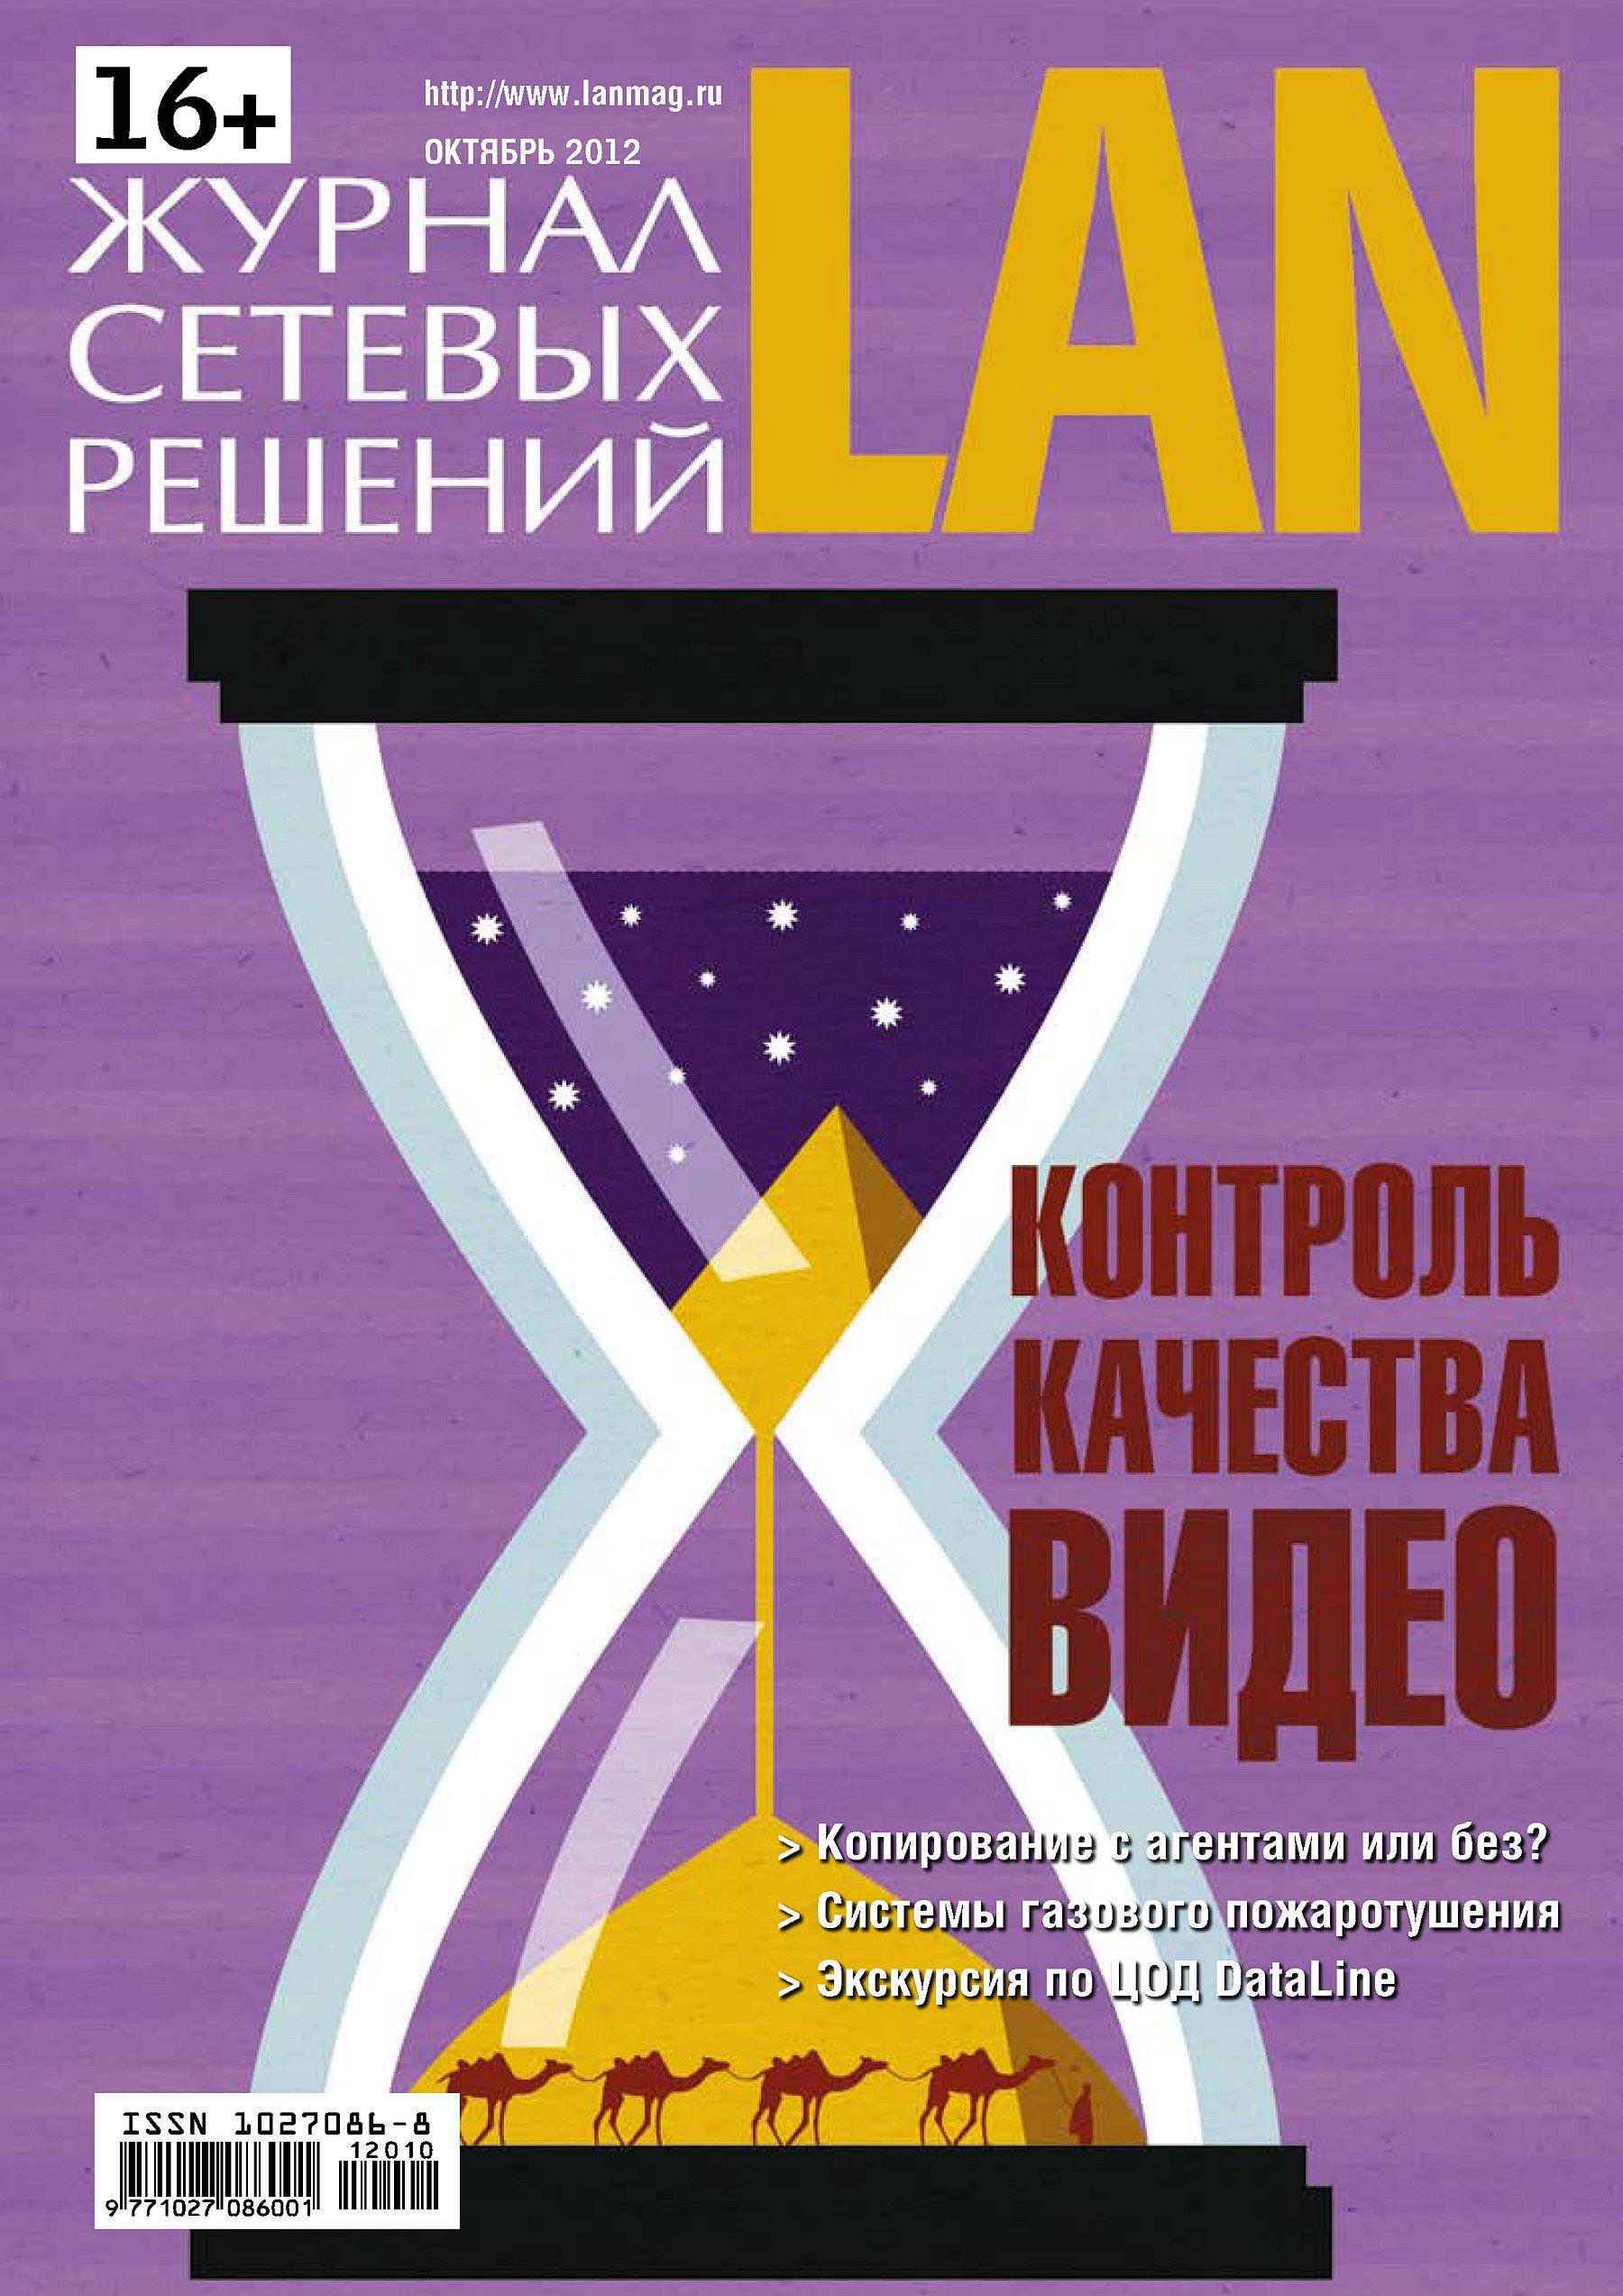 Журнал сетевых решений / LAN №10/2012